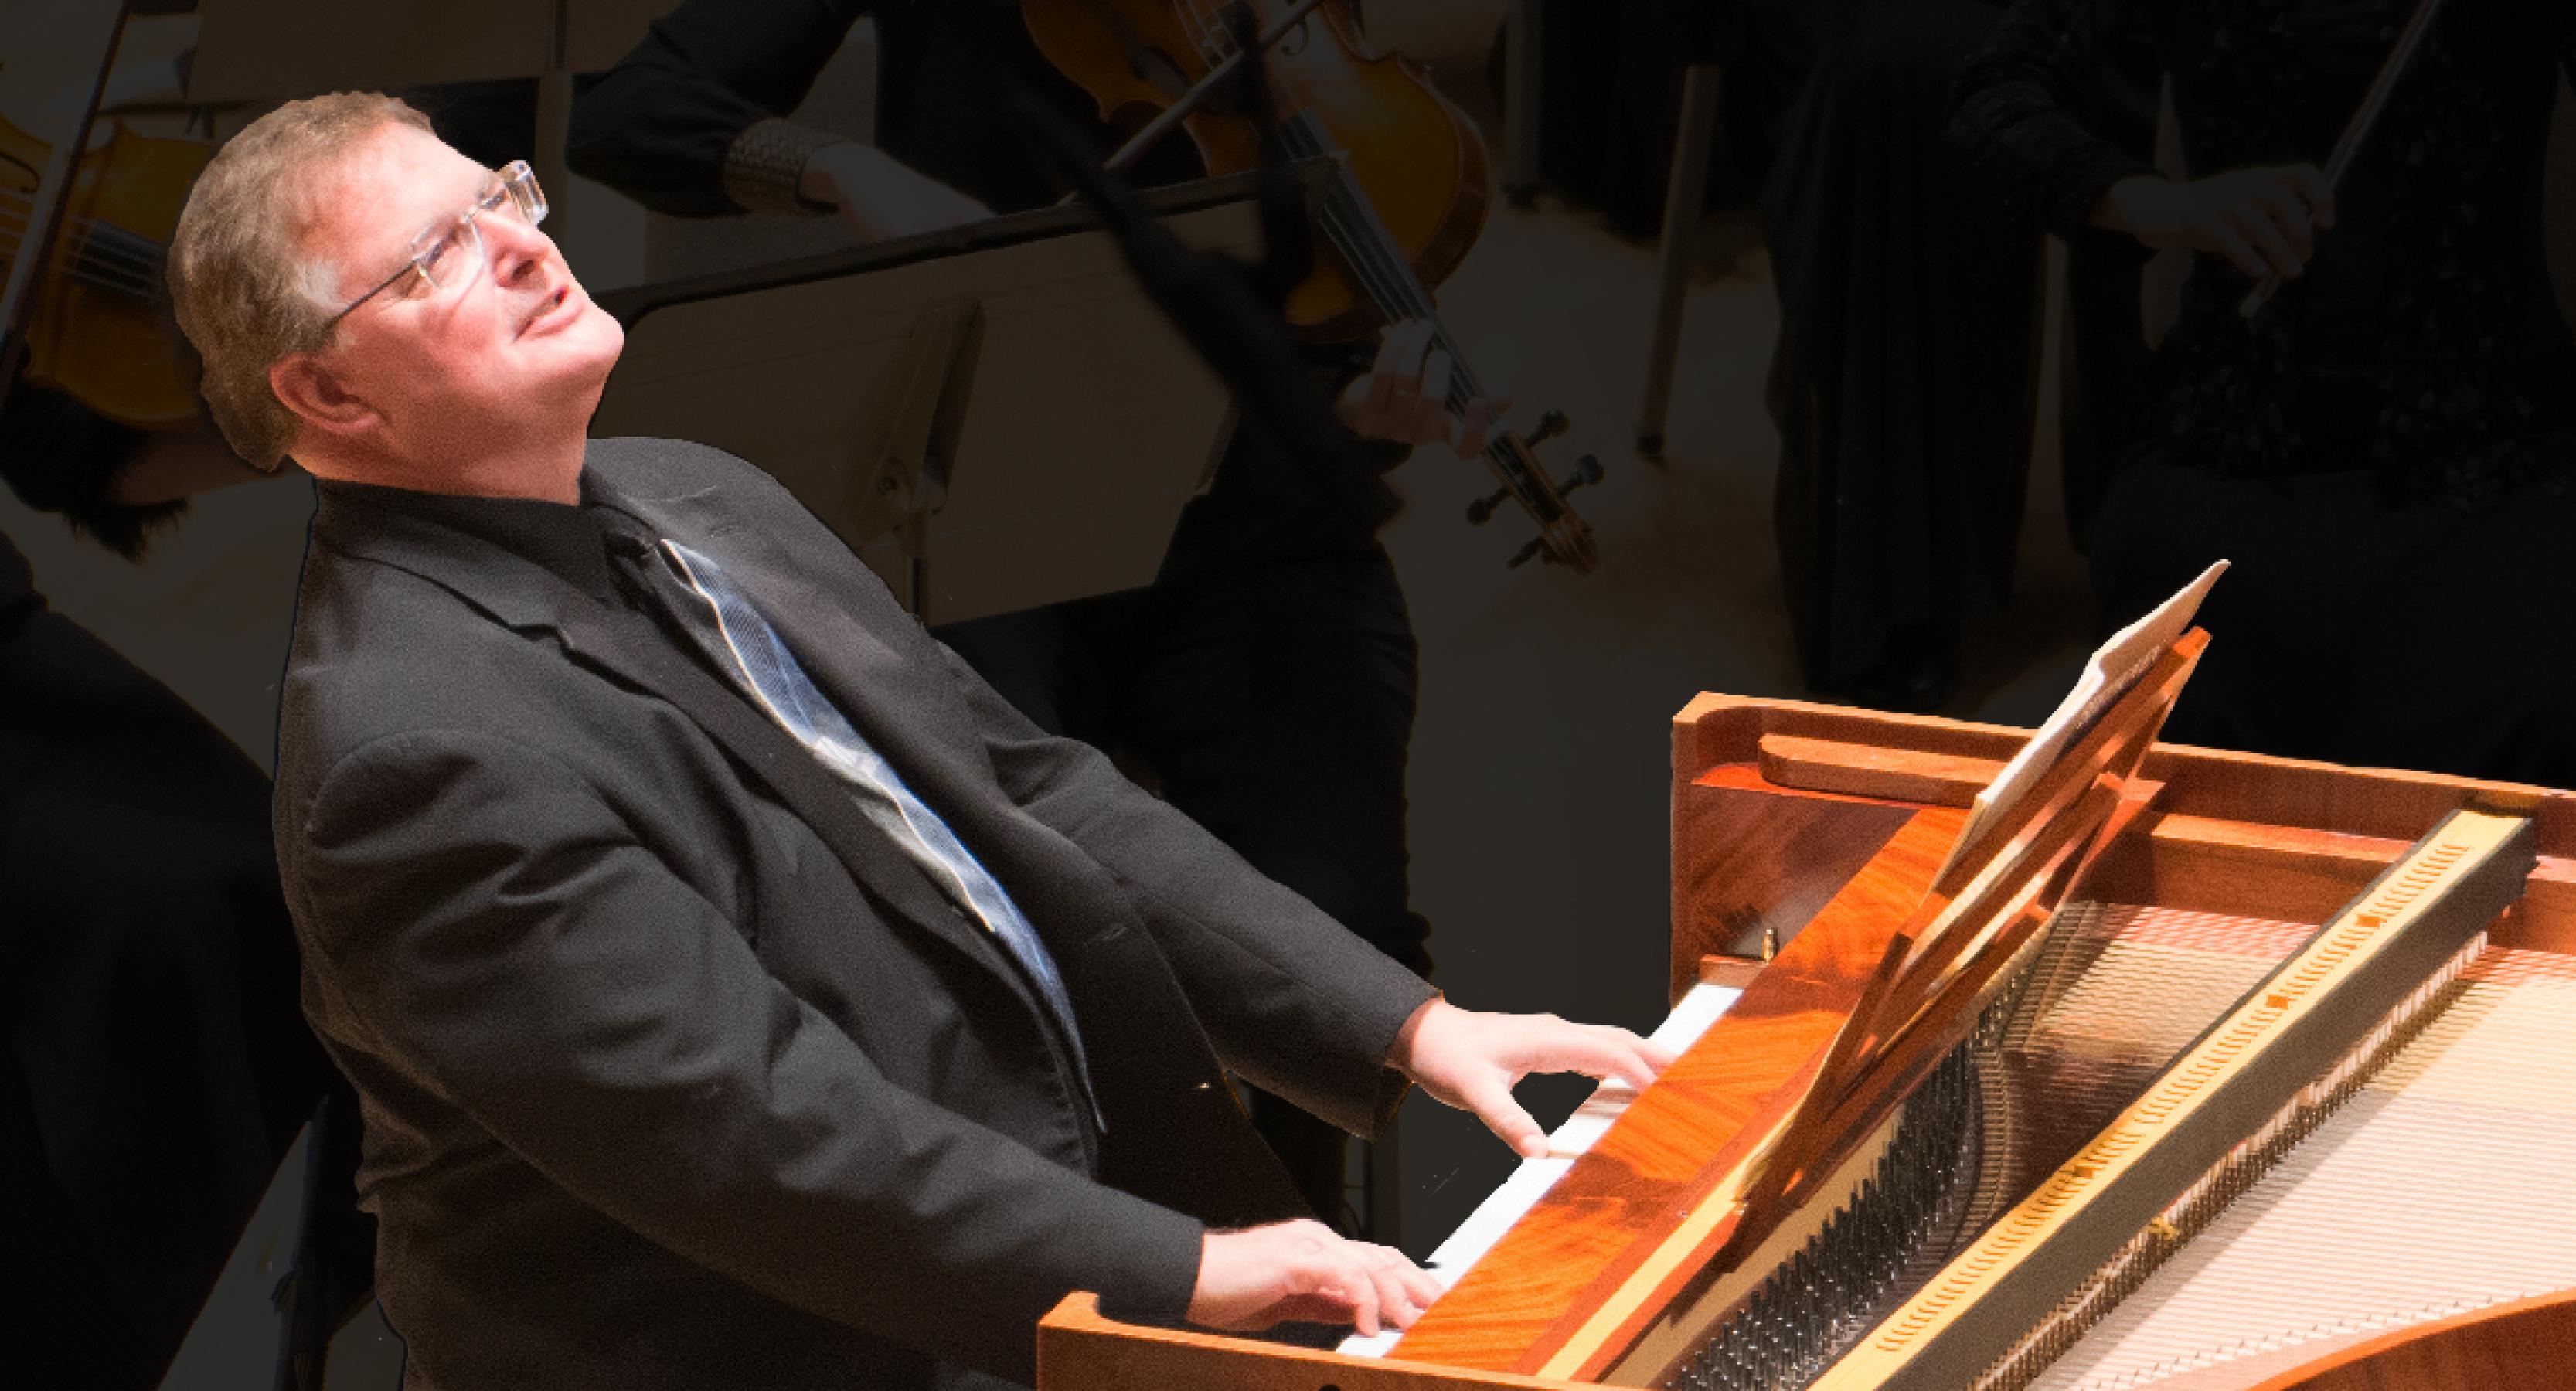 Harpsichordist Ian Watson